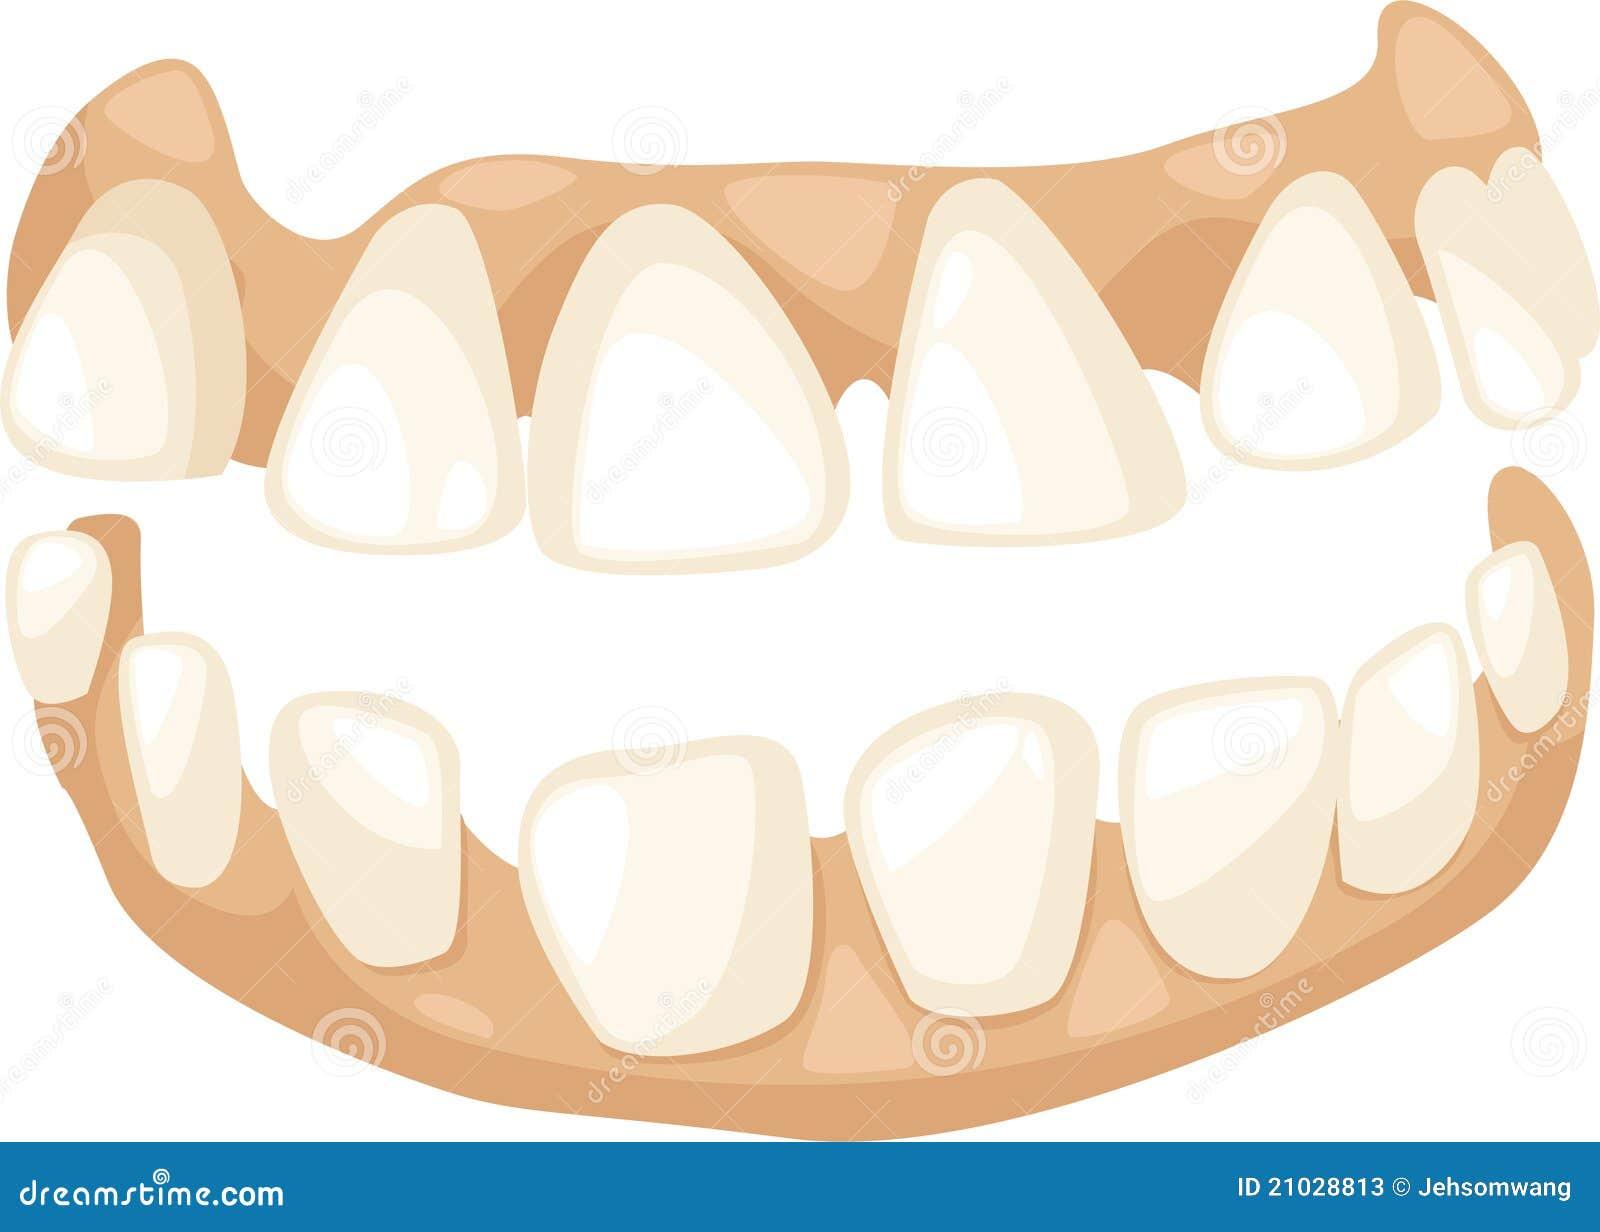 Anatomy teeth vector stock vector. Illustration of cartoon - 21028813